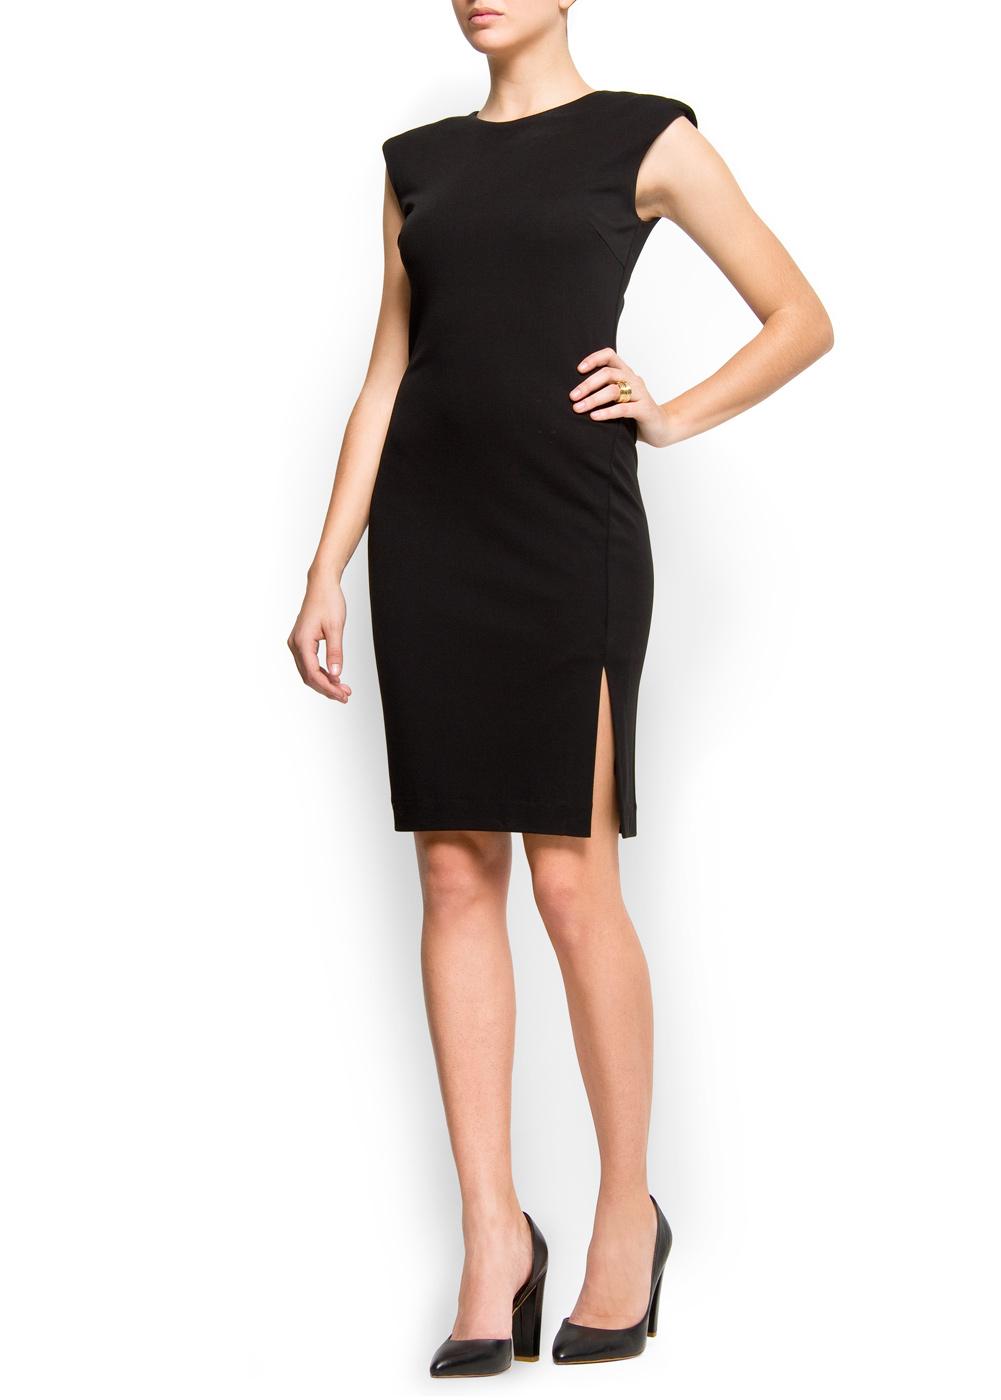 Straight cocktail dress